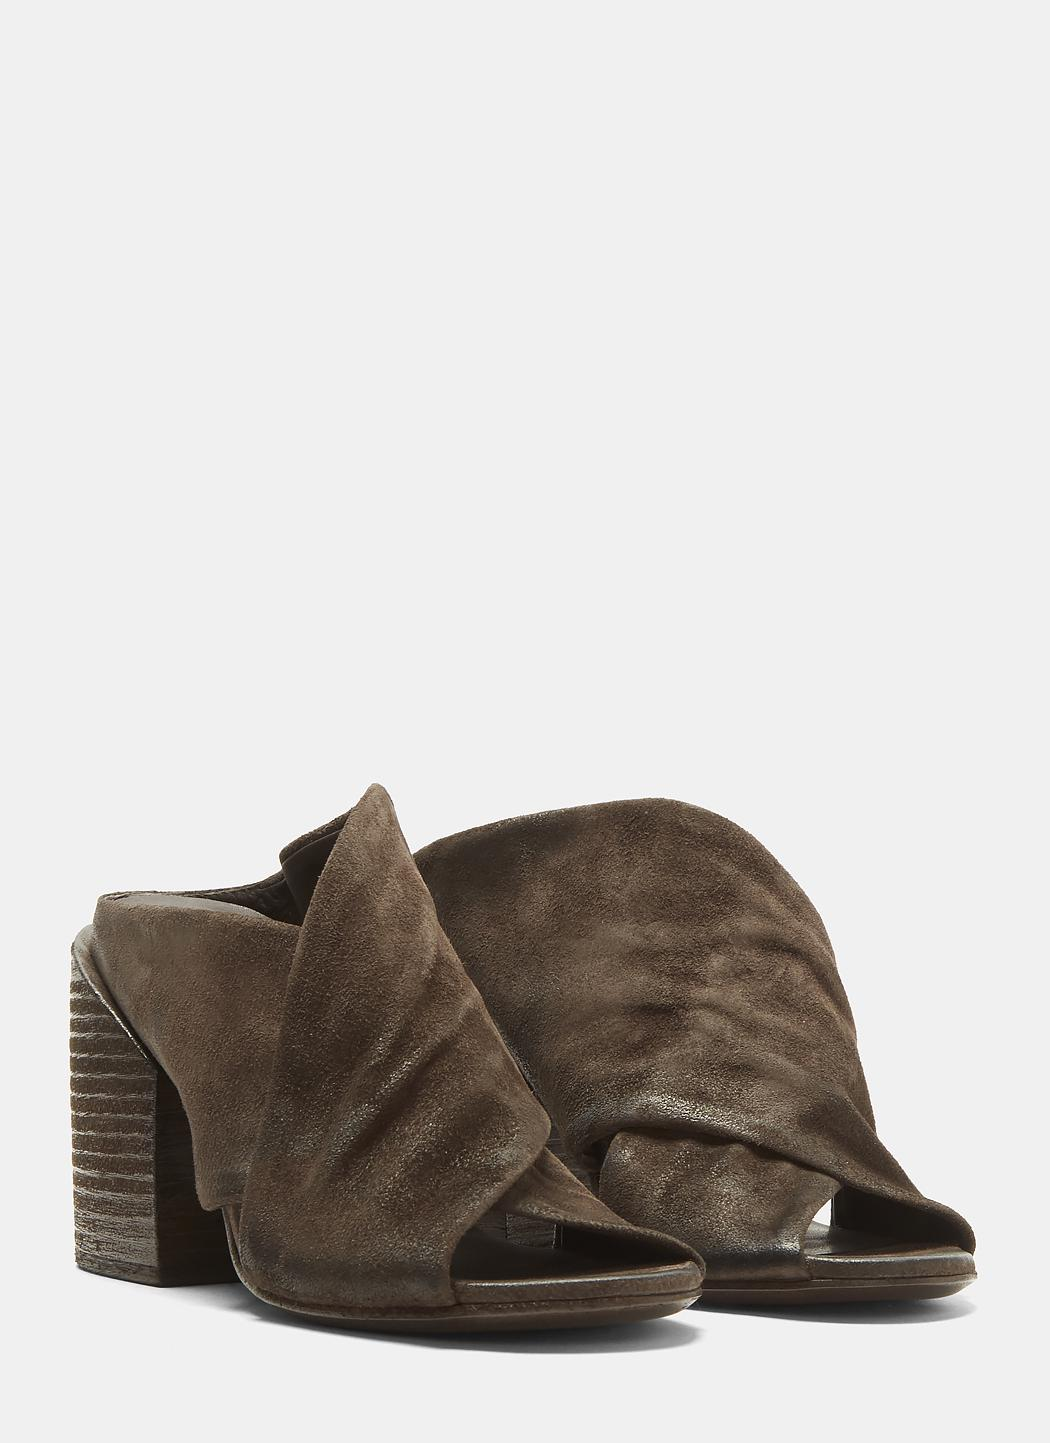 Coltellone Open Toe Sandals Mars qwrHVeS